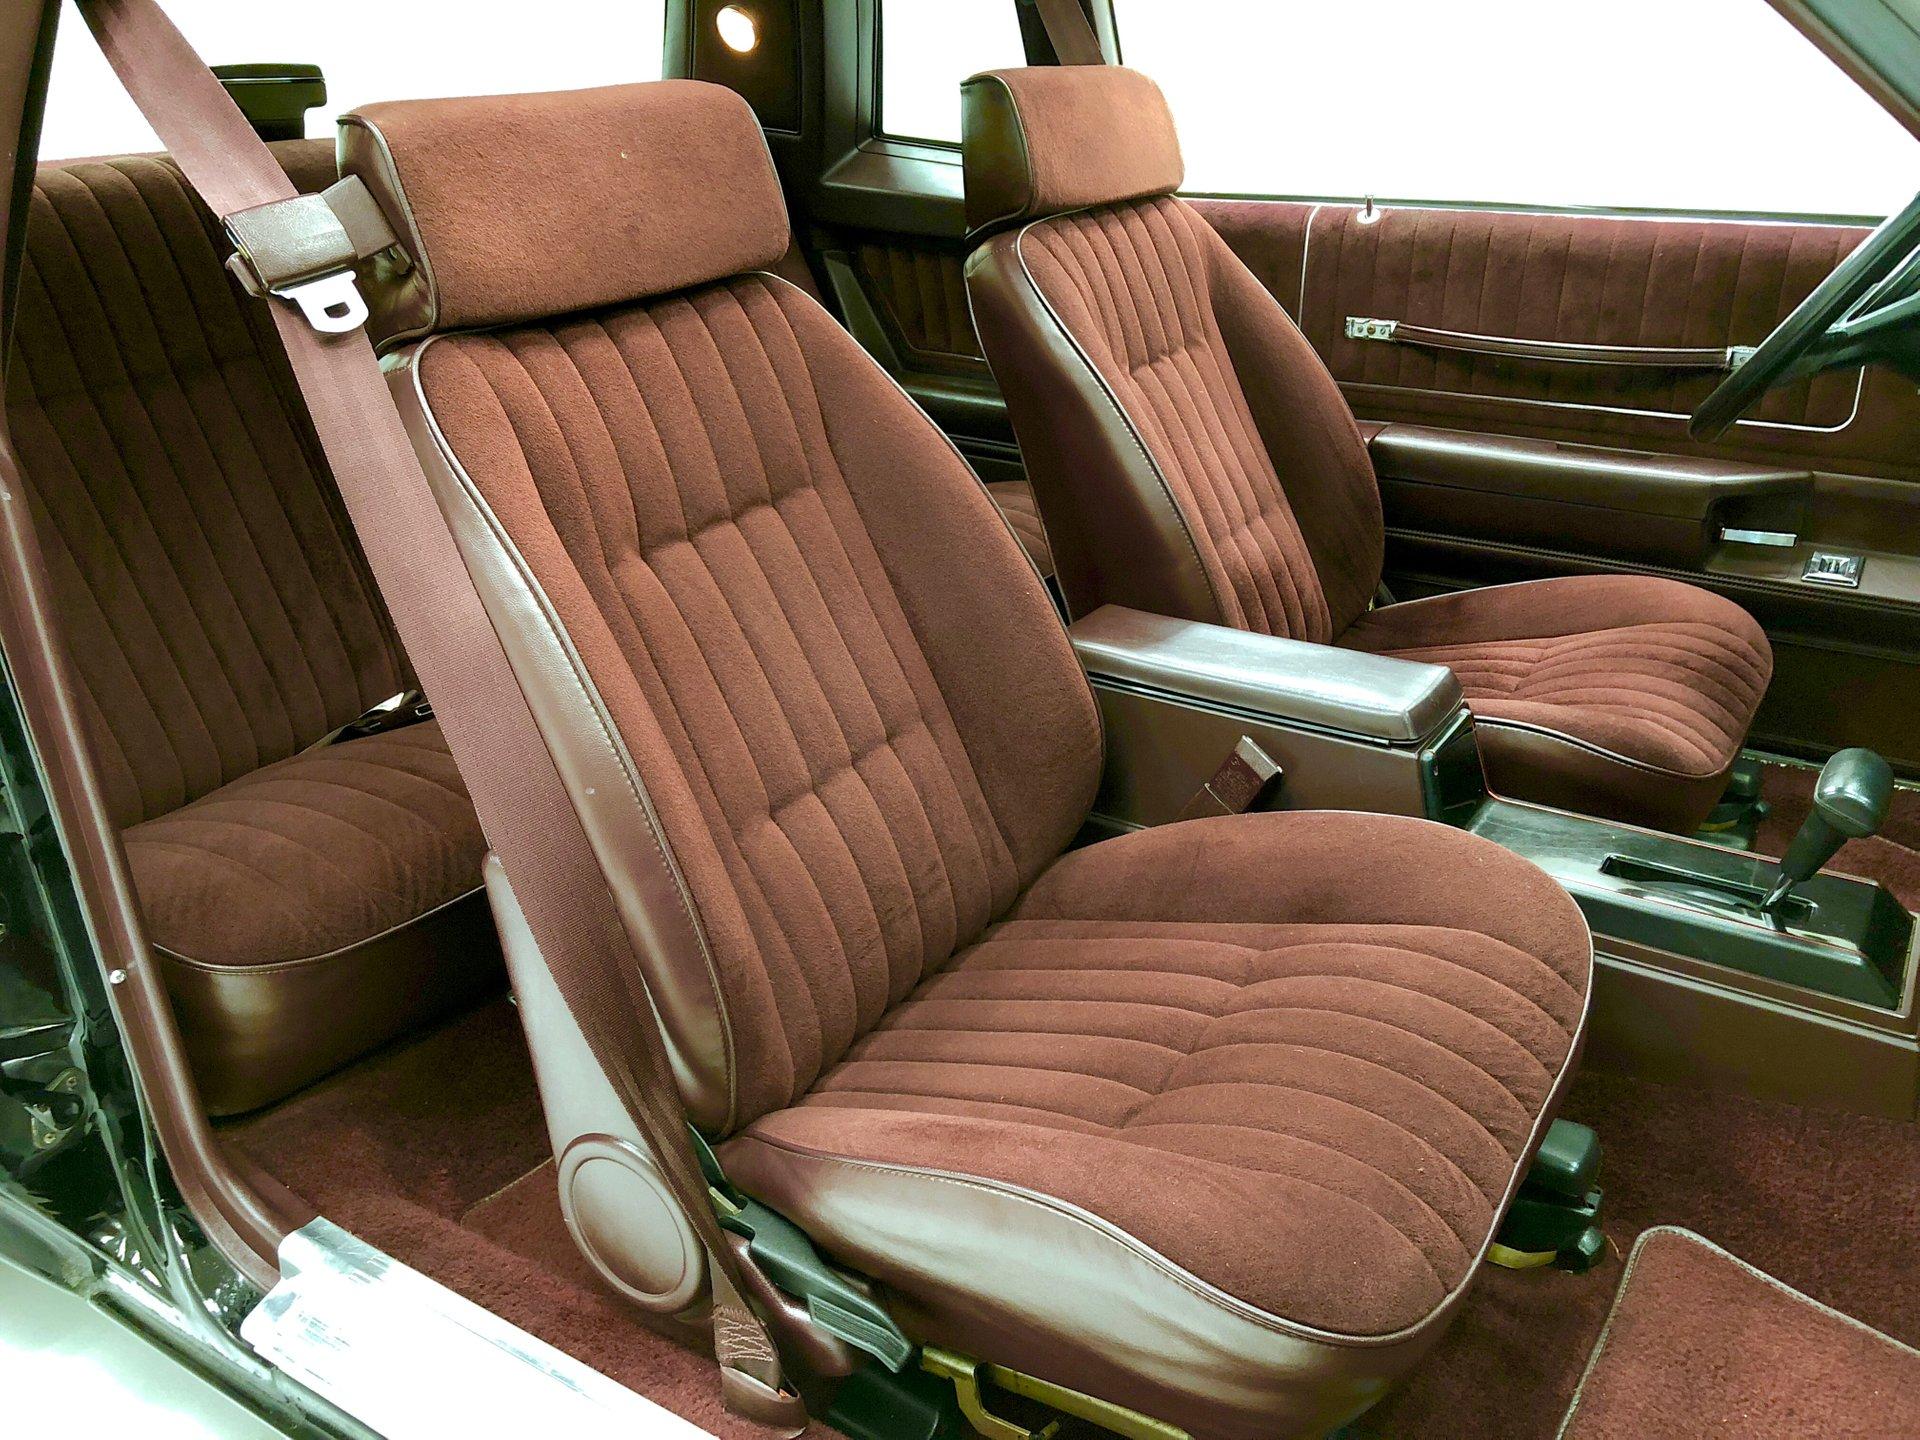 1987 Chevrolet Monte Carlo SS | Berlin Motors